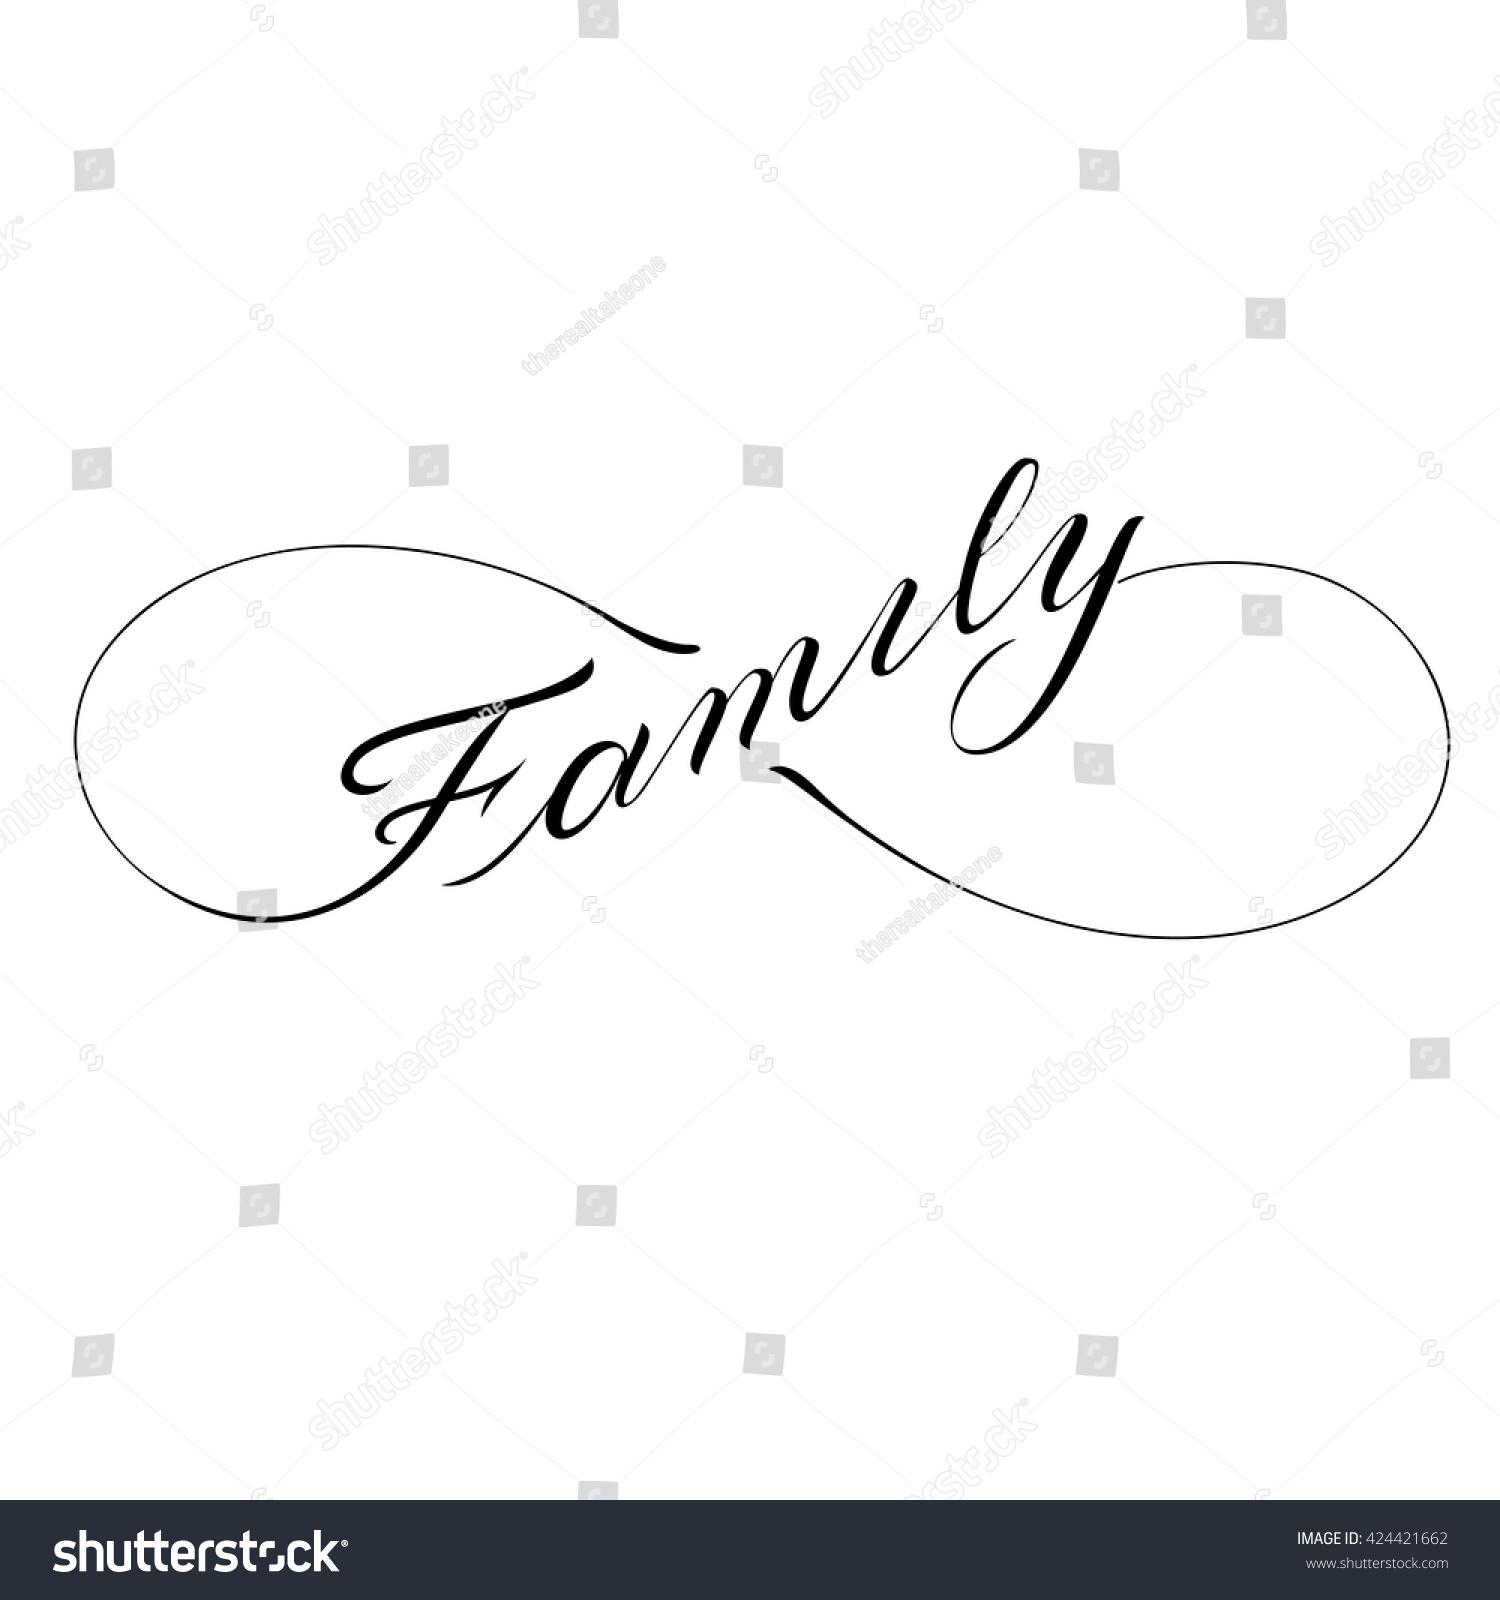 Looks - Infinity Family symbol video